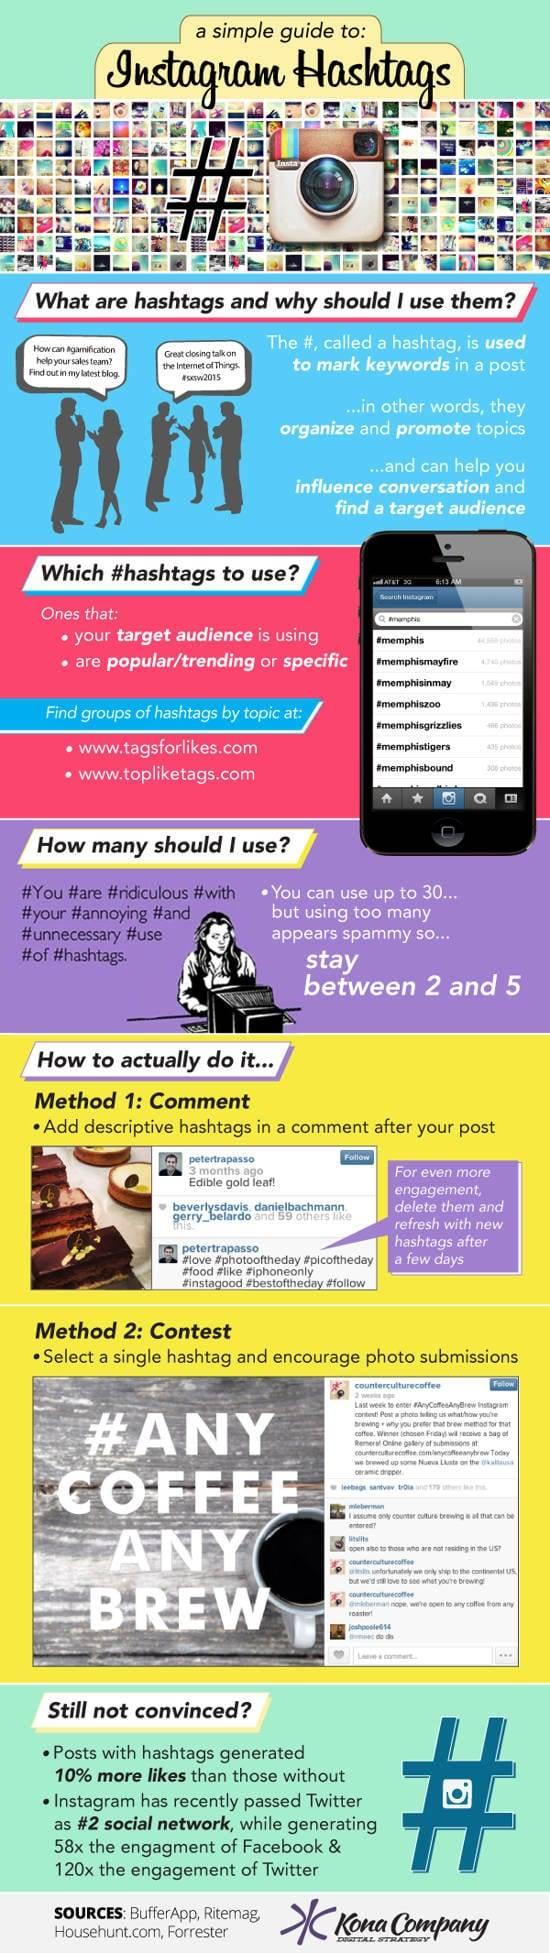 uso de los hashtags en Instagram infografia